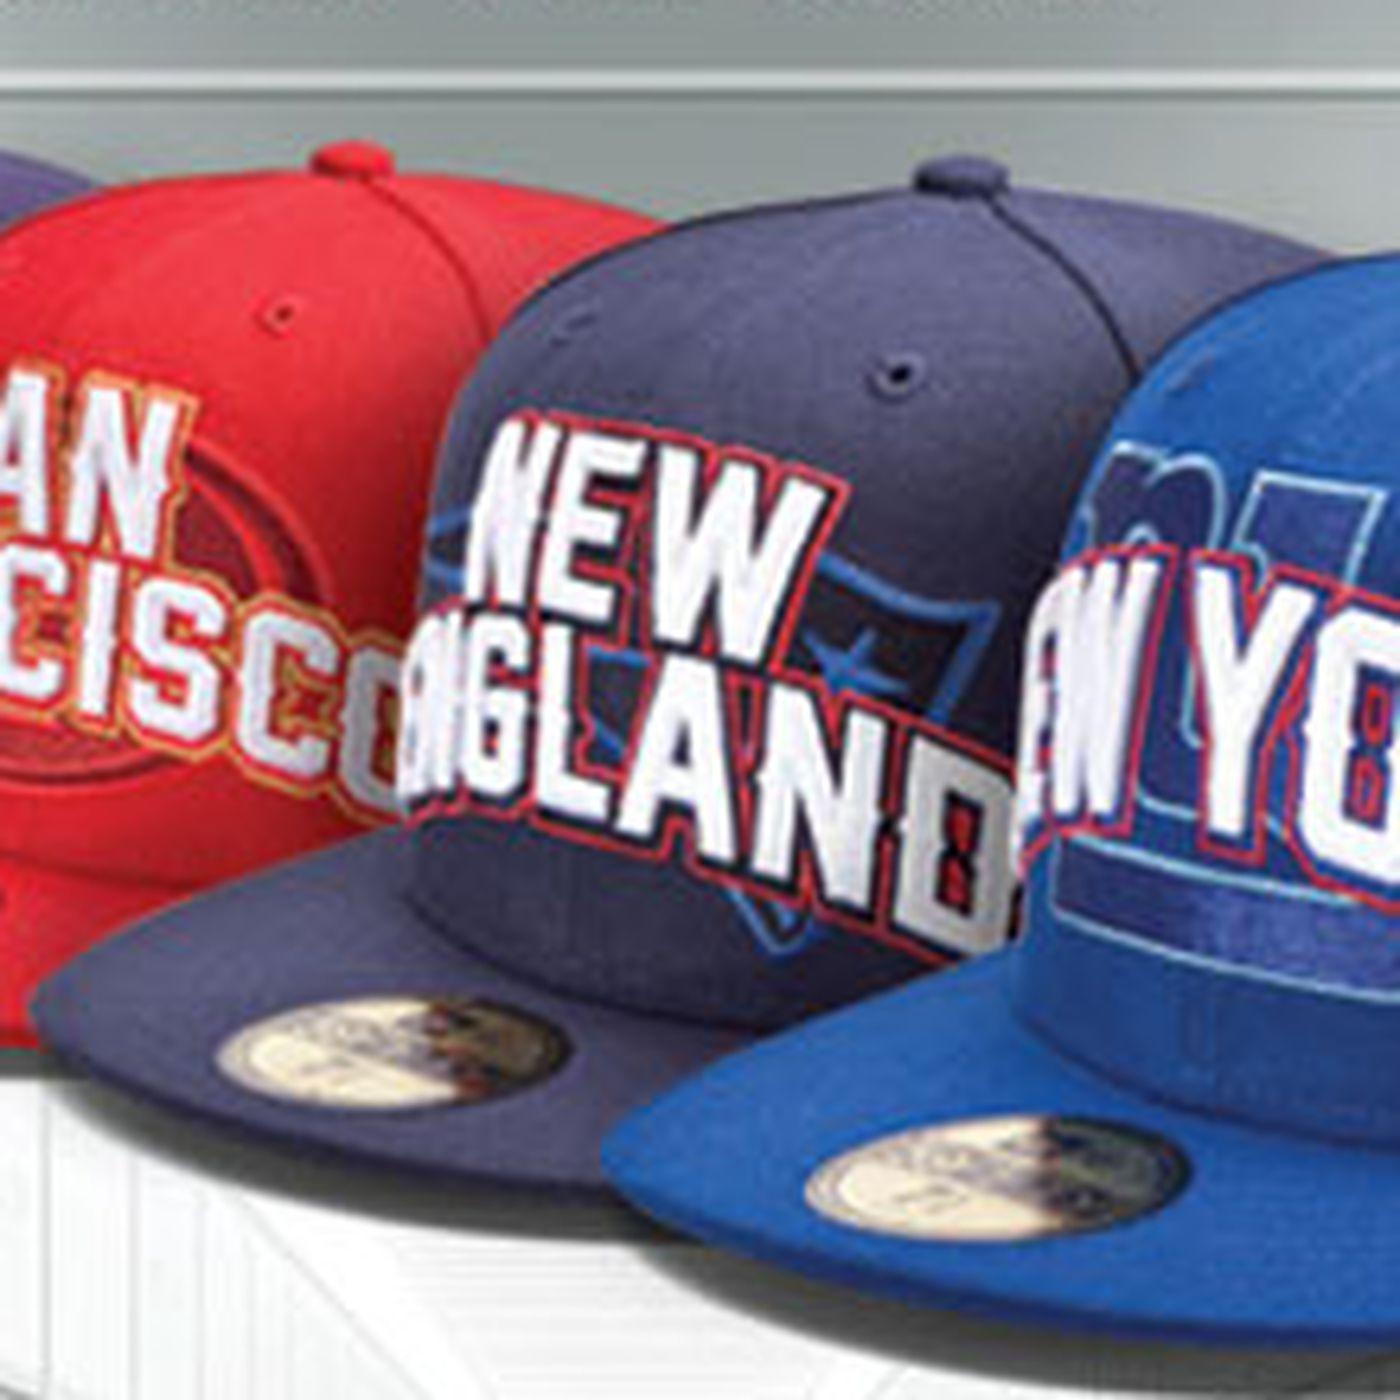 111ac33044f New Era Unveils 2012 NFL Draft Hats - SBNation.com